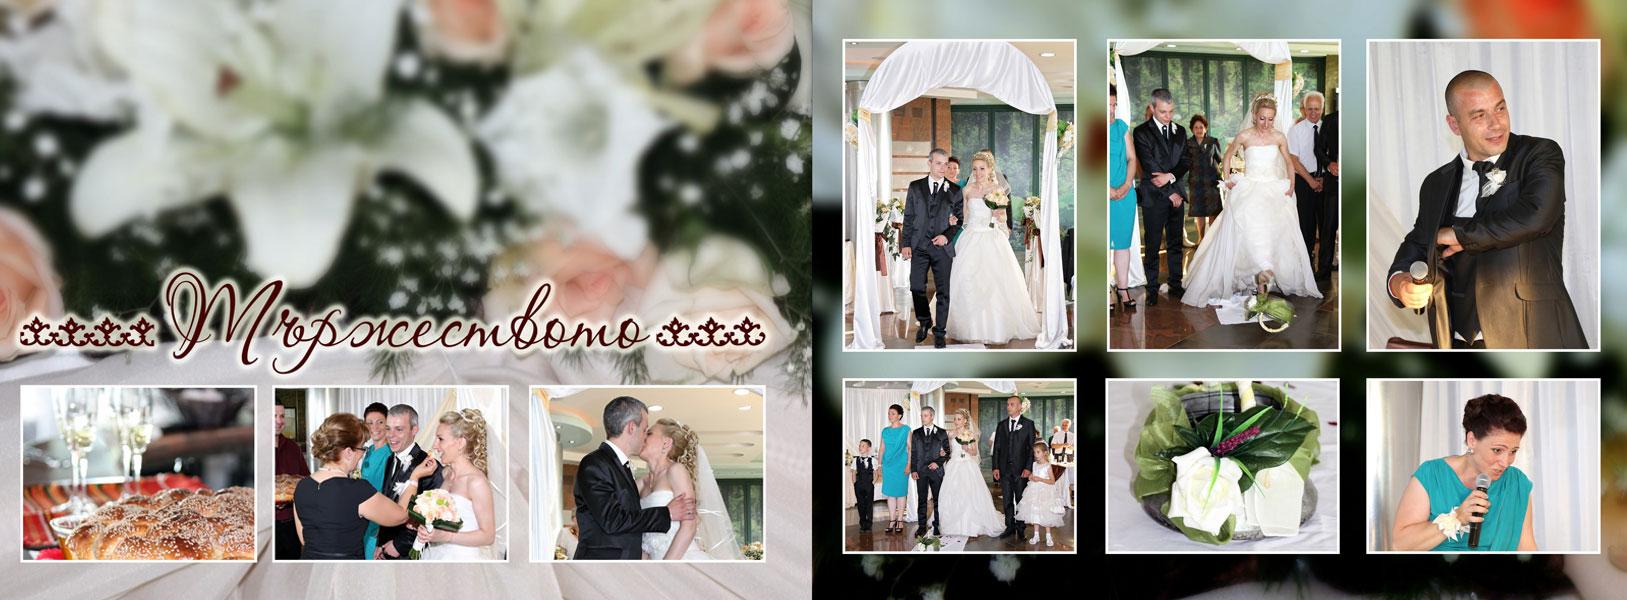 Drag Studio | Детска и сватбена фотография. | 24-25.jpg